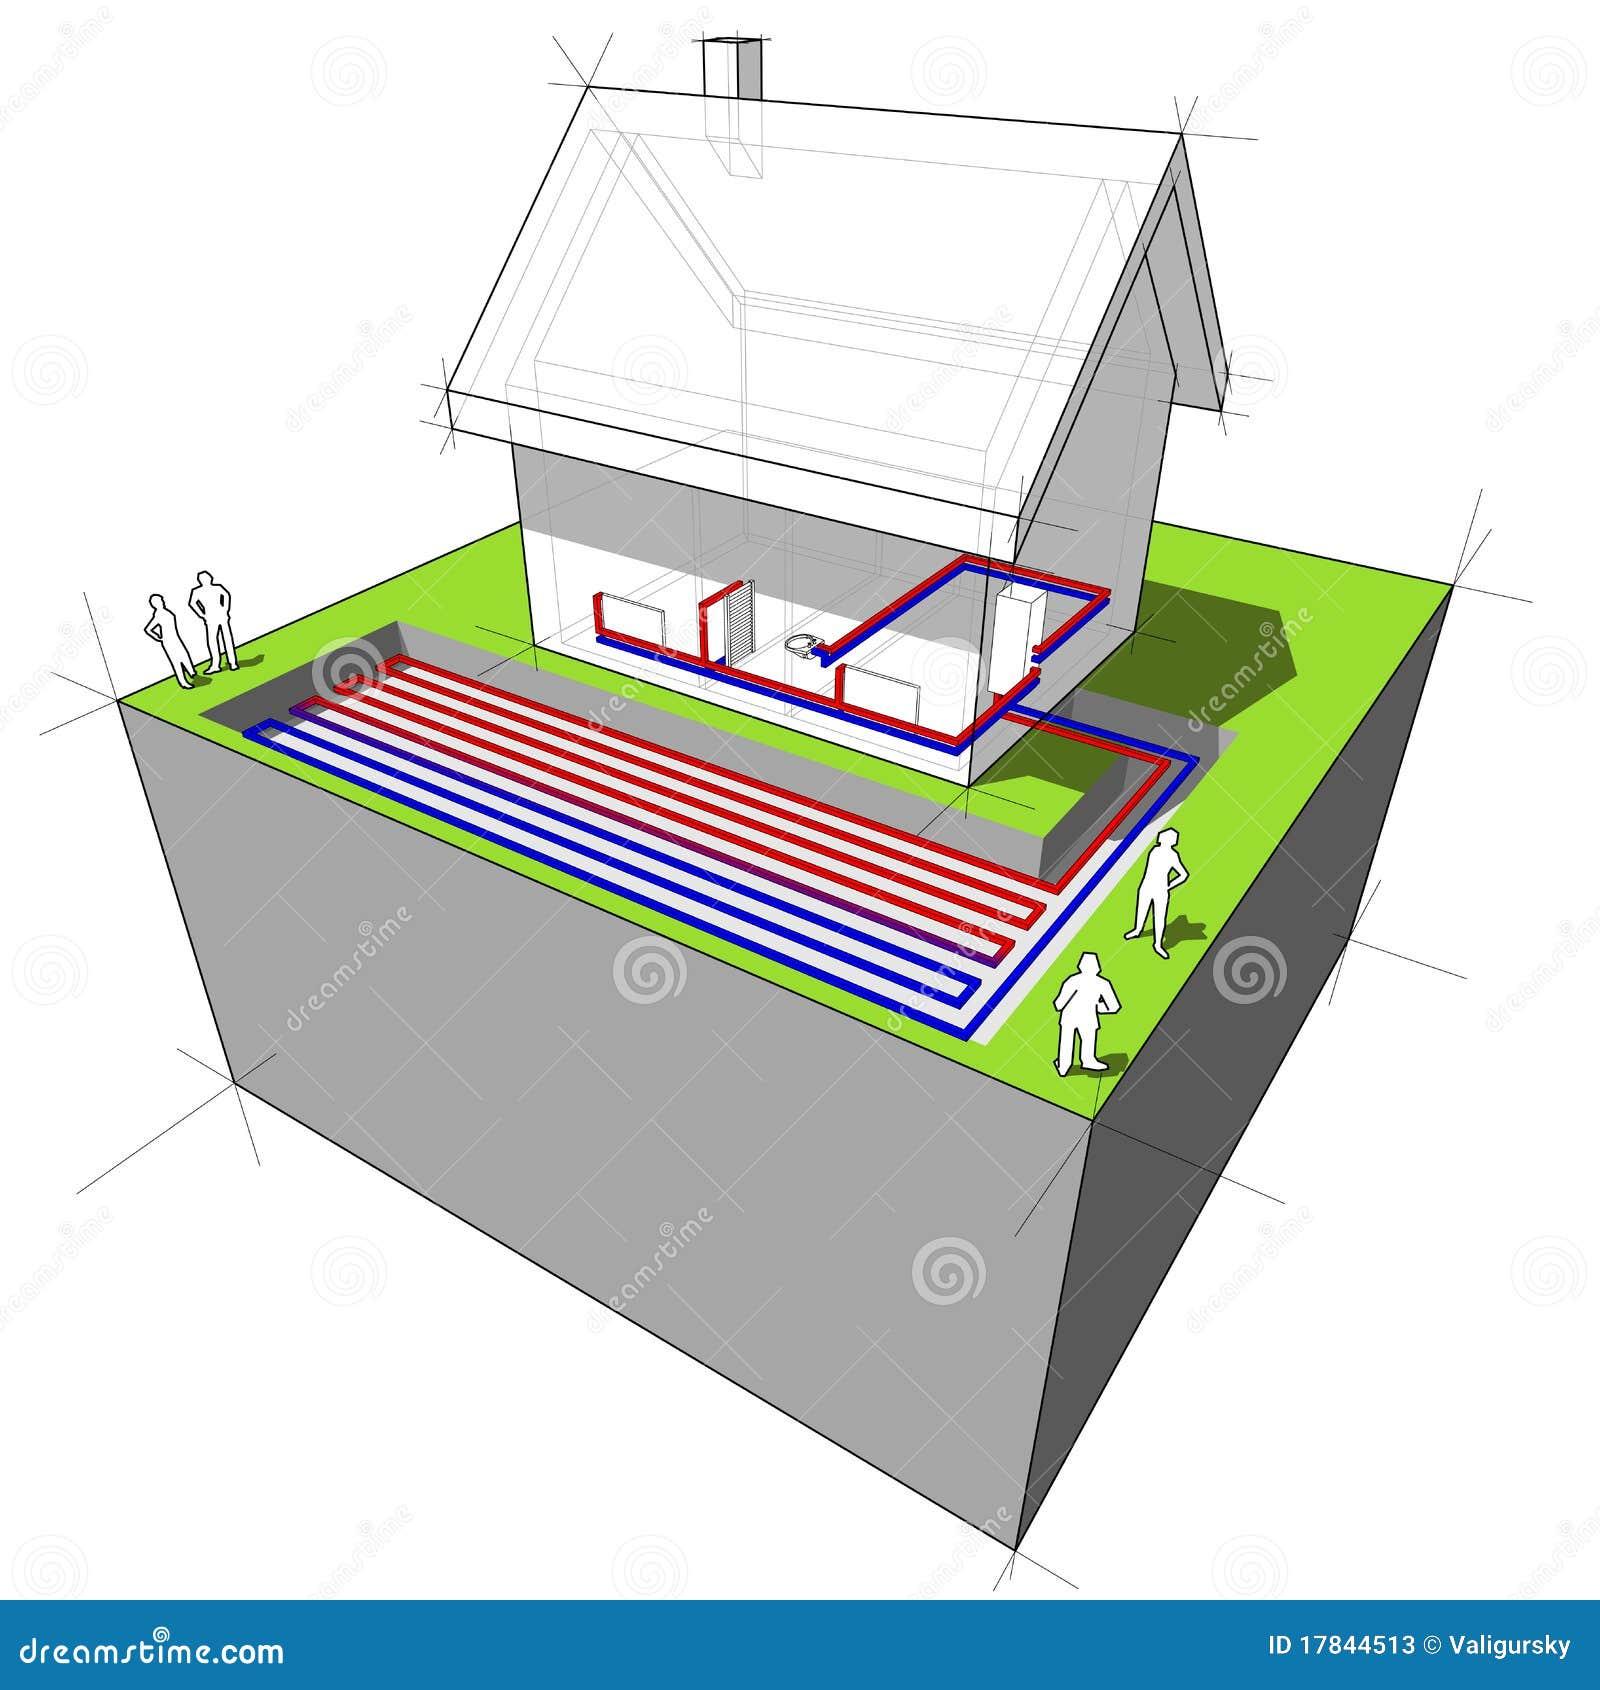 Heat pump diagram stock vector illustration of renewable 17844513 heat pump diagram pooptronica